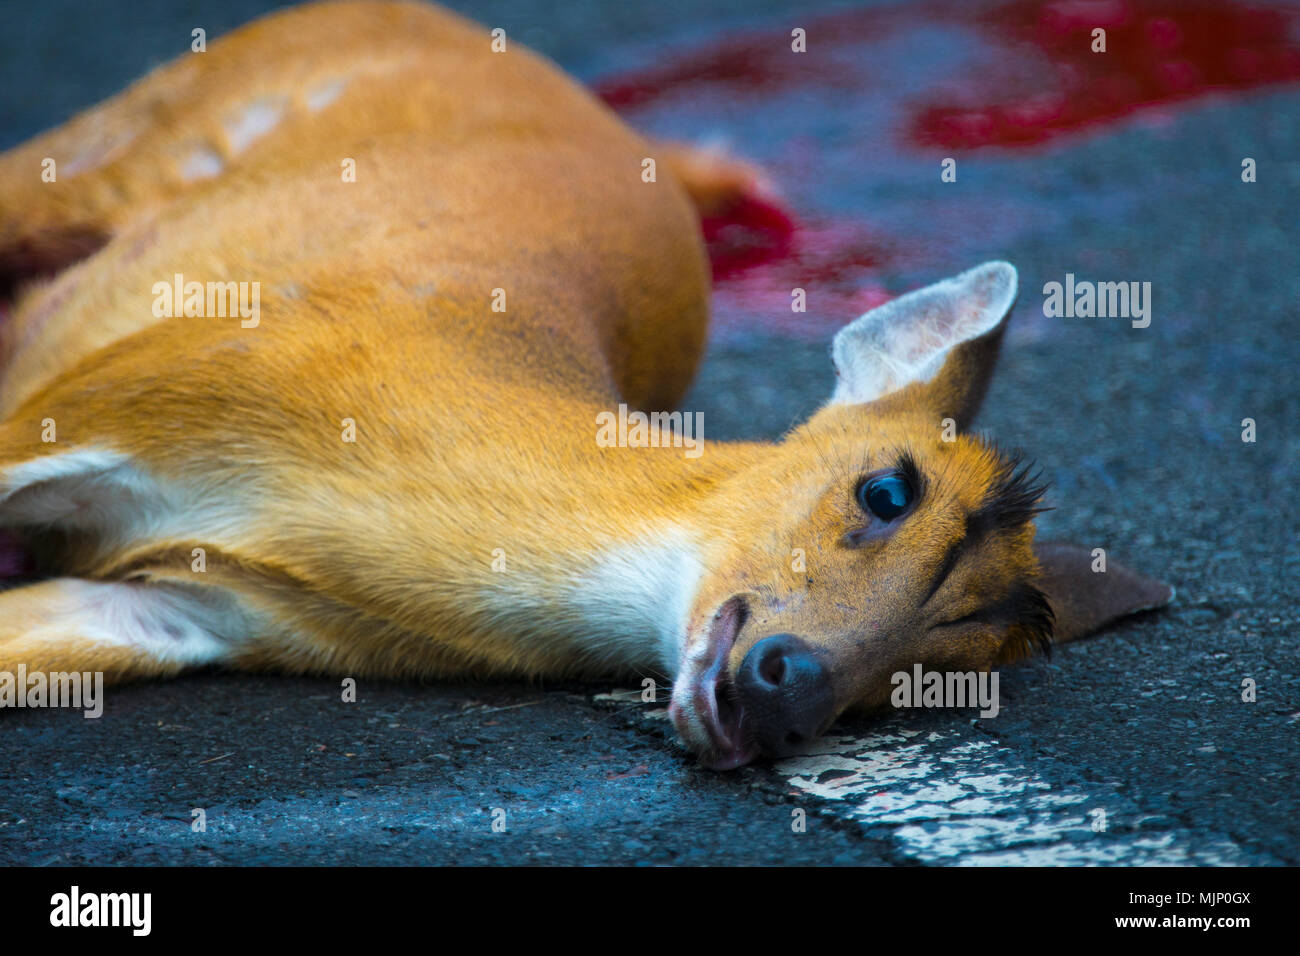 Animal Vehicle Collision Stock Photos & Animal Vehicle Collision